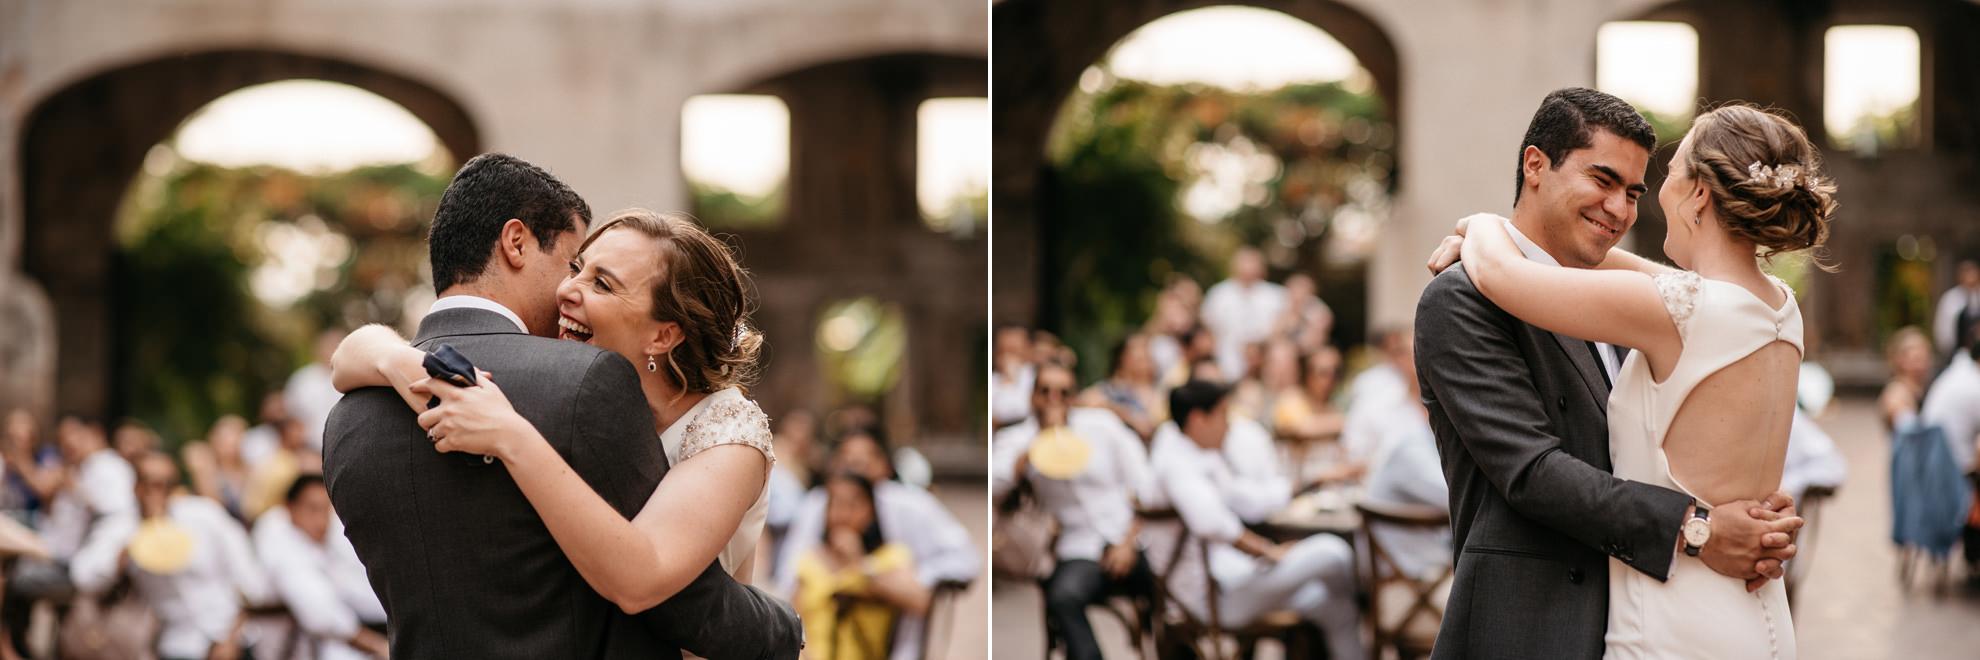 068 - wedding hacienda san carlos.jpg